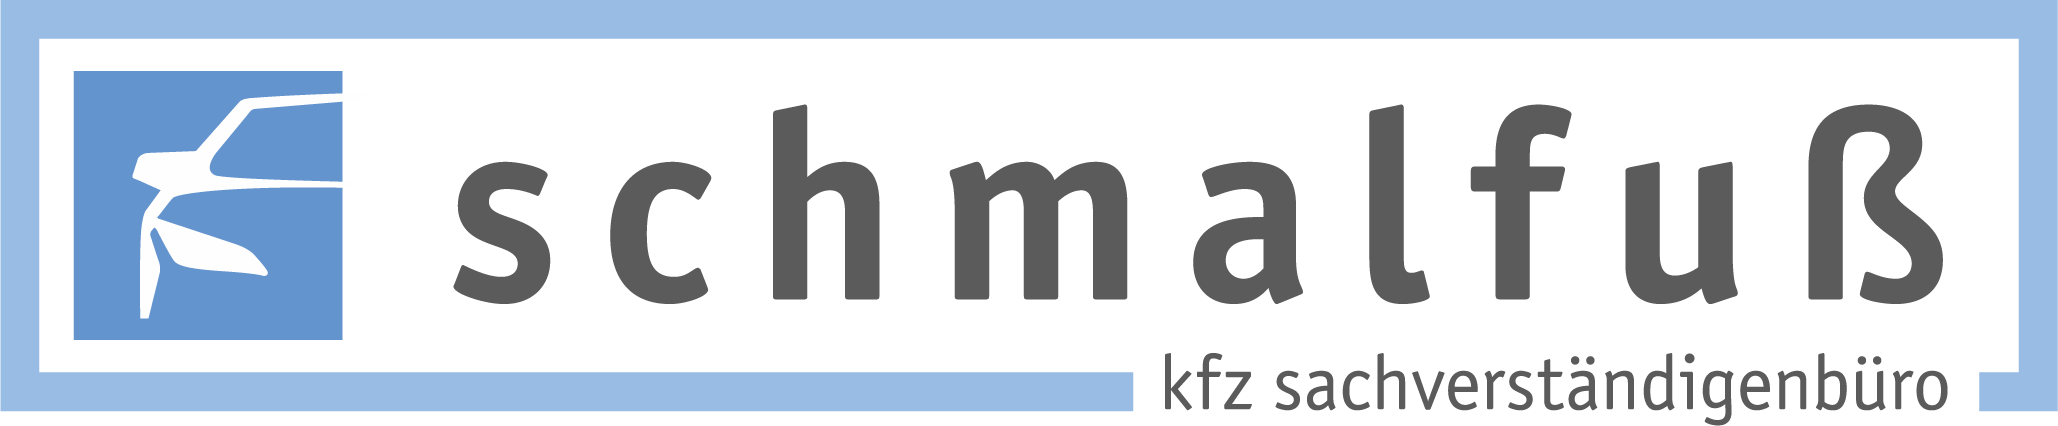 KFZ Sachverständigenbüro Falk Schmalfuß